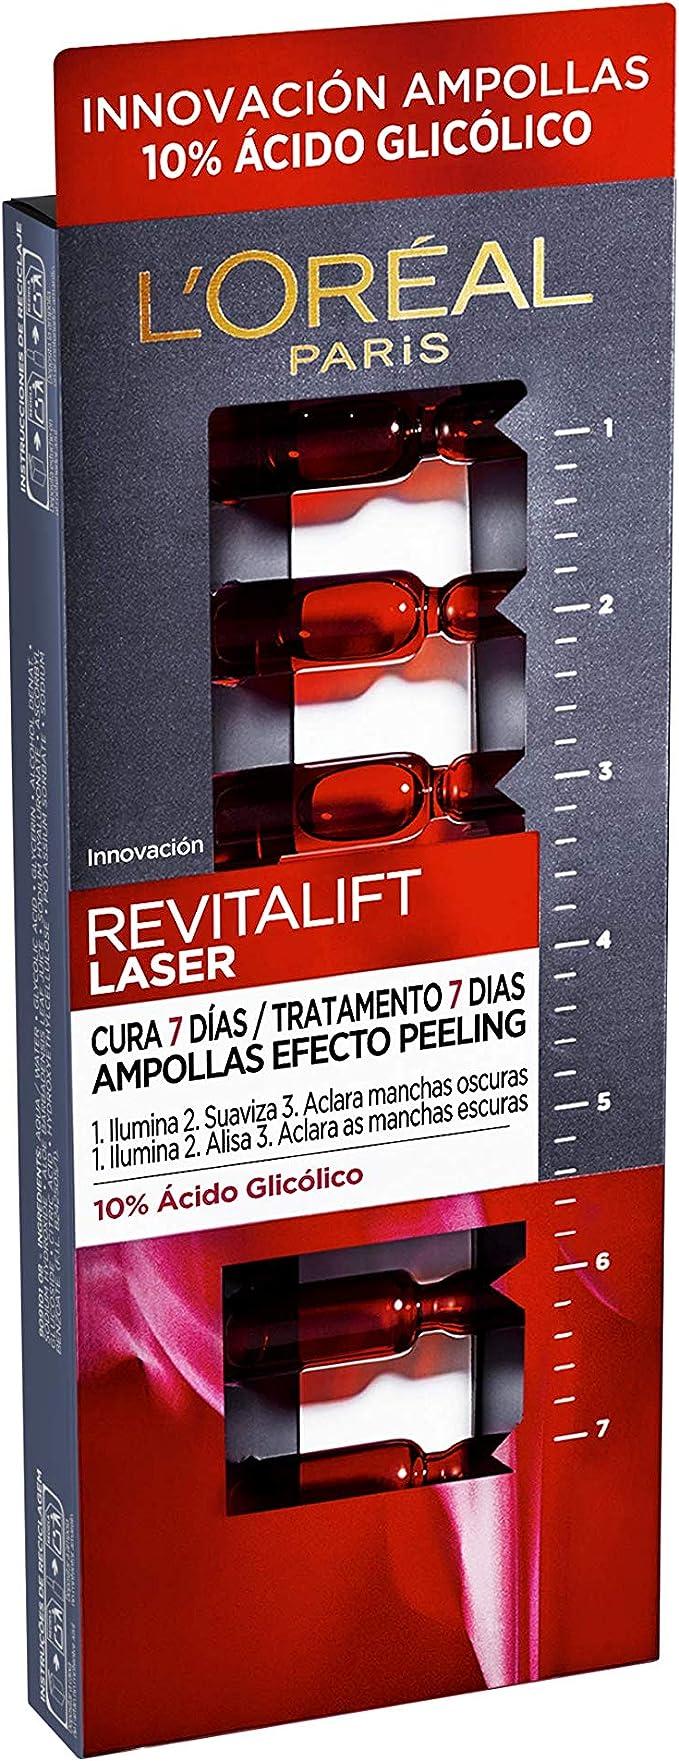 L Oréal Paris Revitalift Láser Ampollas Efecto Peeling Para 7 Días Con ácido Glicólico 7 Unidades 1 3 Ml Amazon Es Belleza